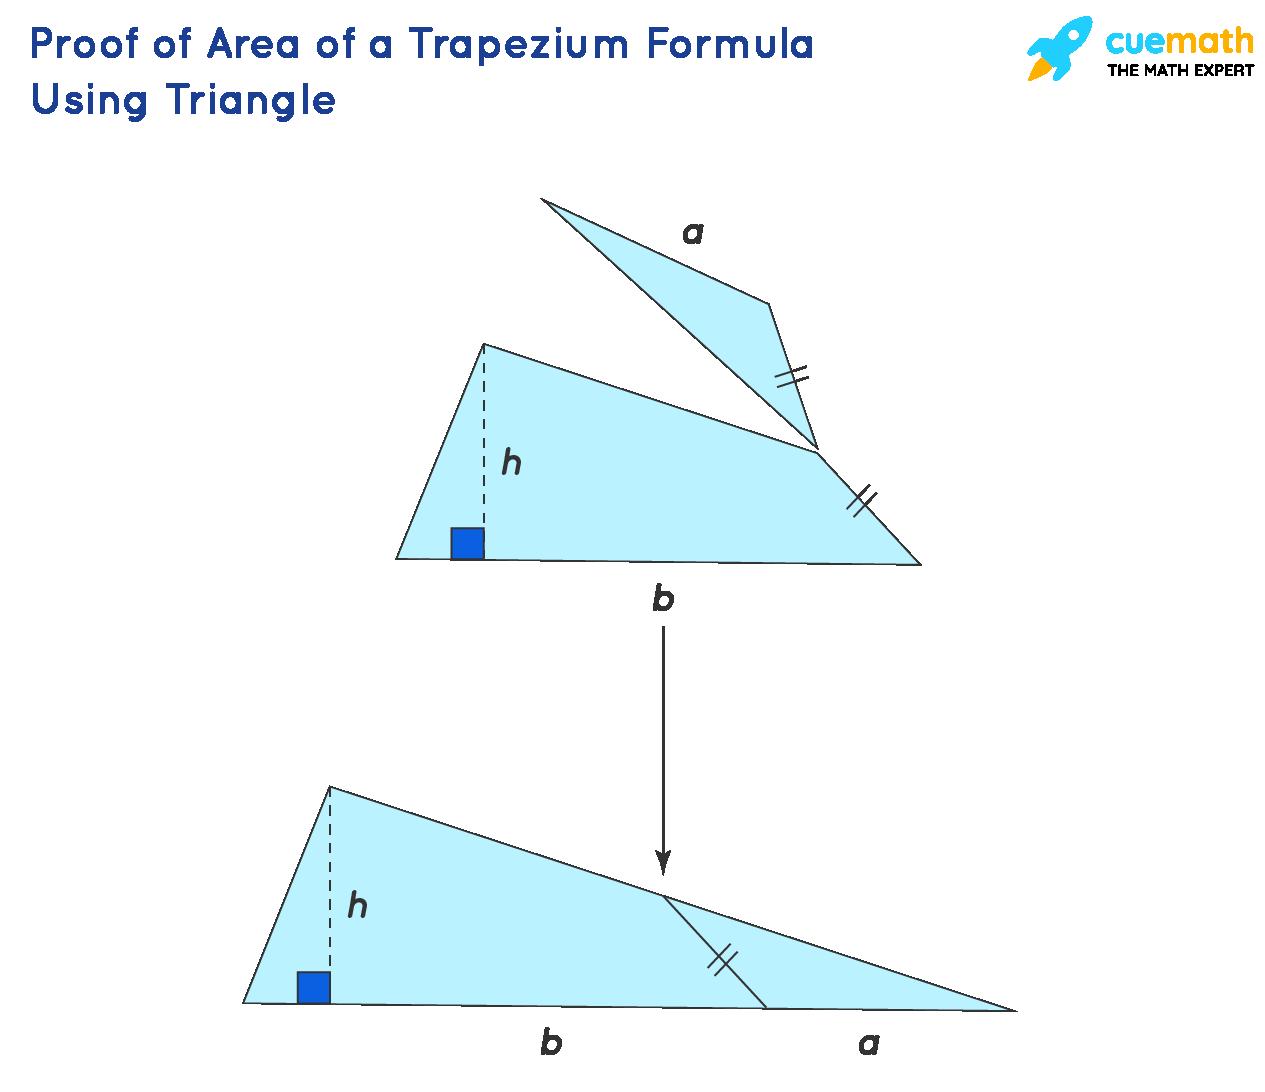 Proof of area of trapezium formula